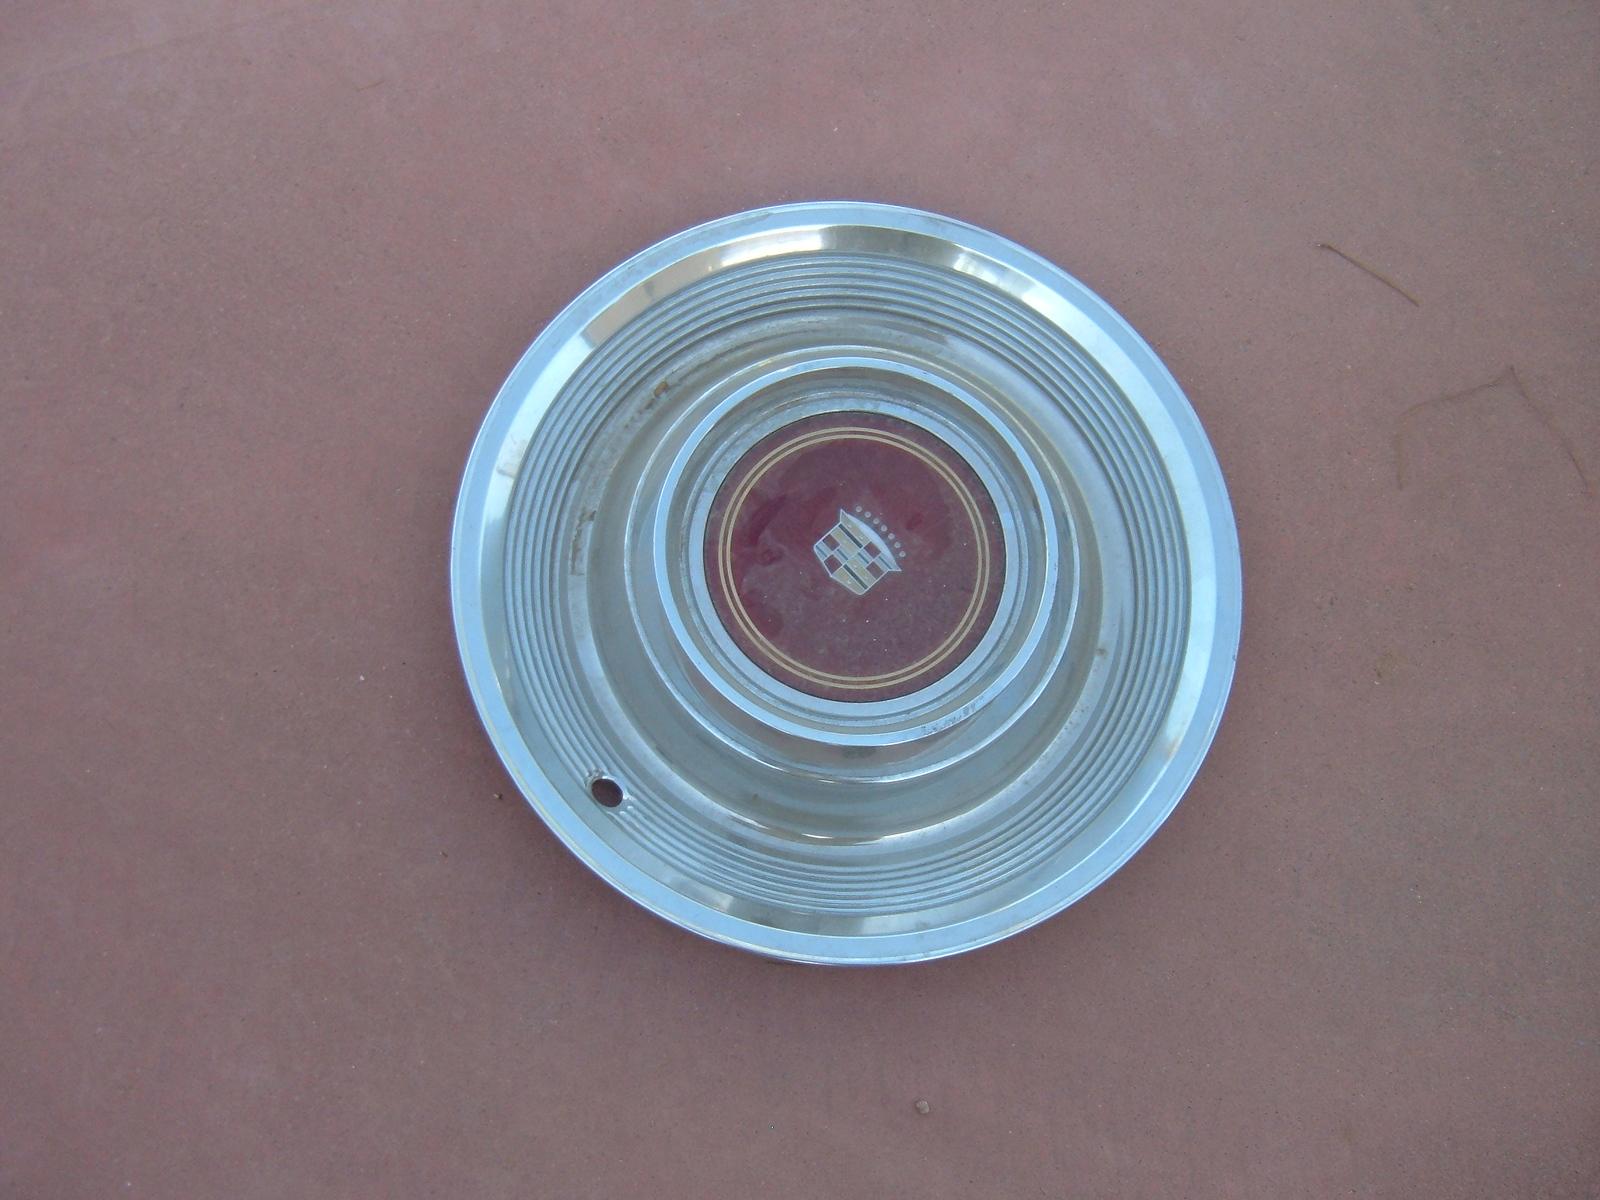 1980 1981 cadillac hub caps nos gm deville models (z 81 cadillachubcap)